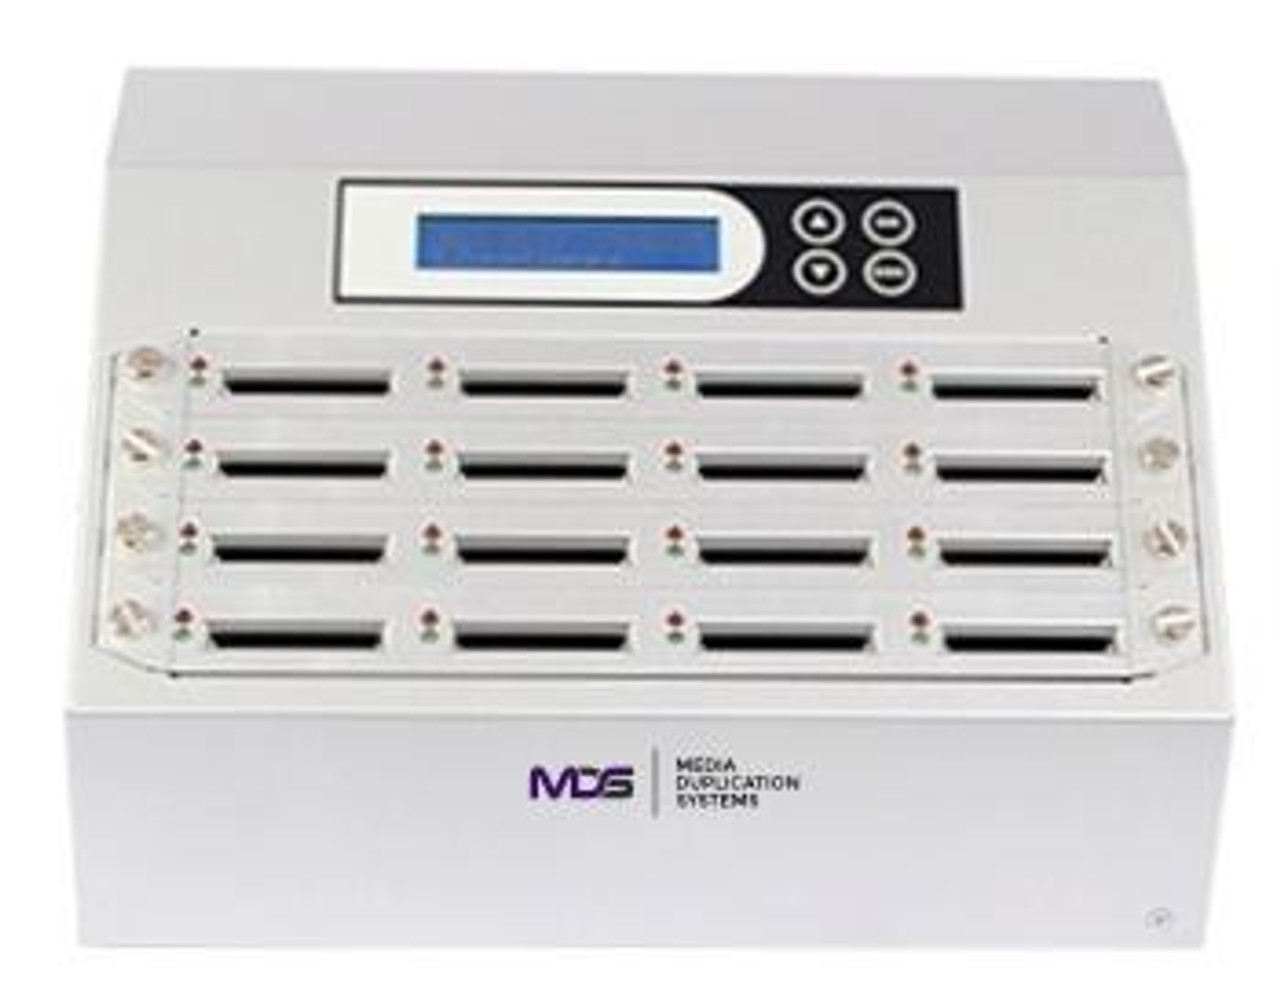 DupliCFast 1 TO 15 Compact Flash Memory Card Duplicator